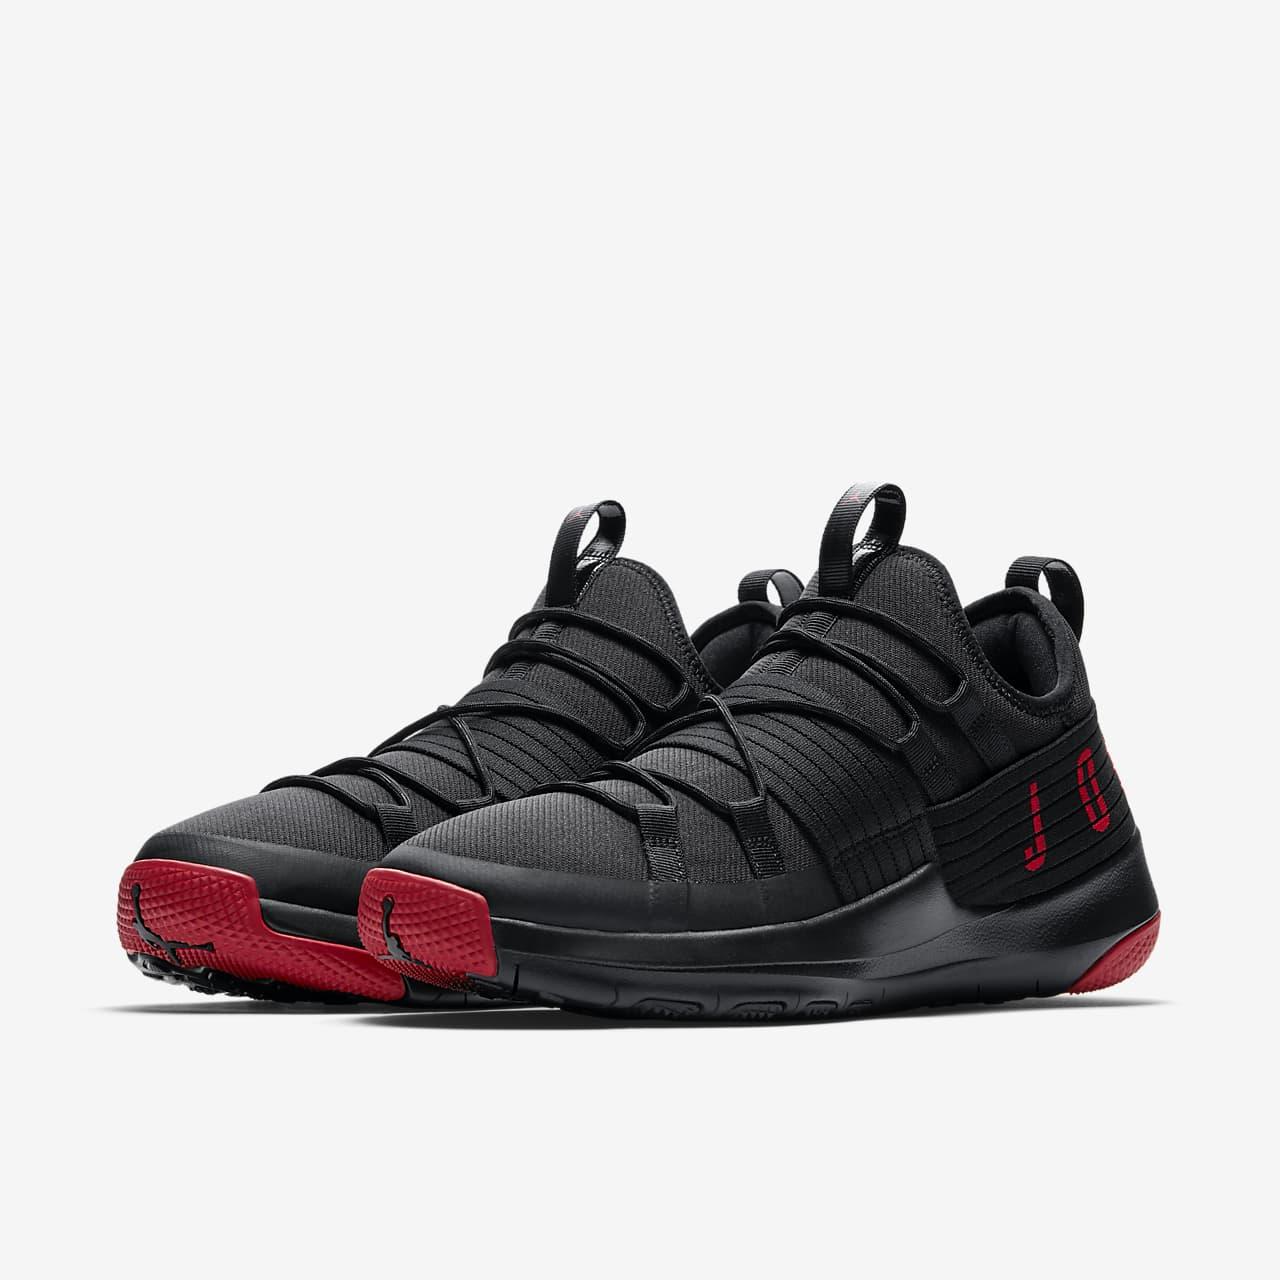 Jordan Trainer Pro Men's Training Shoe